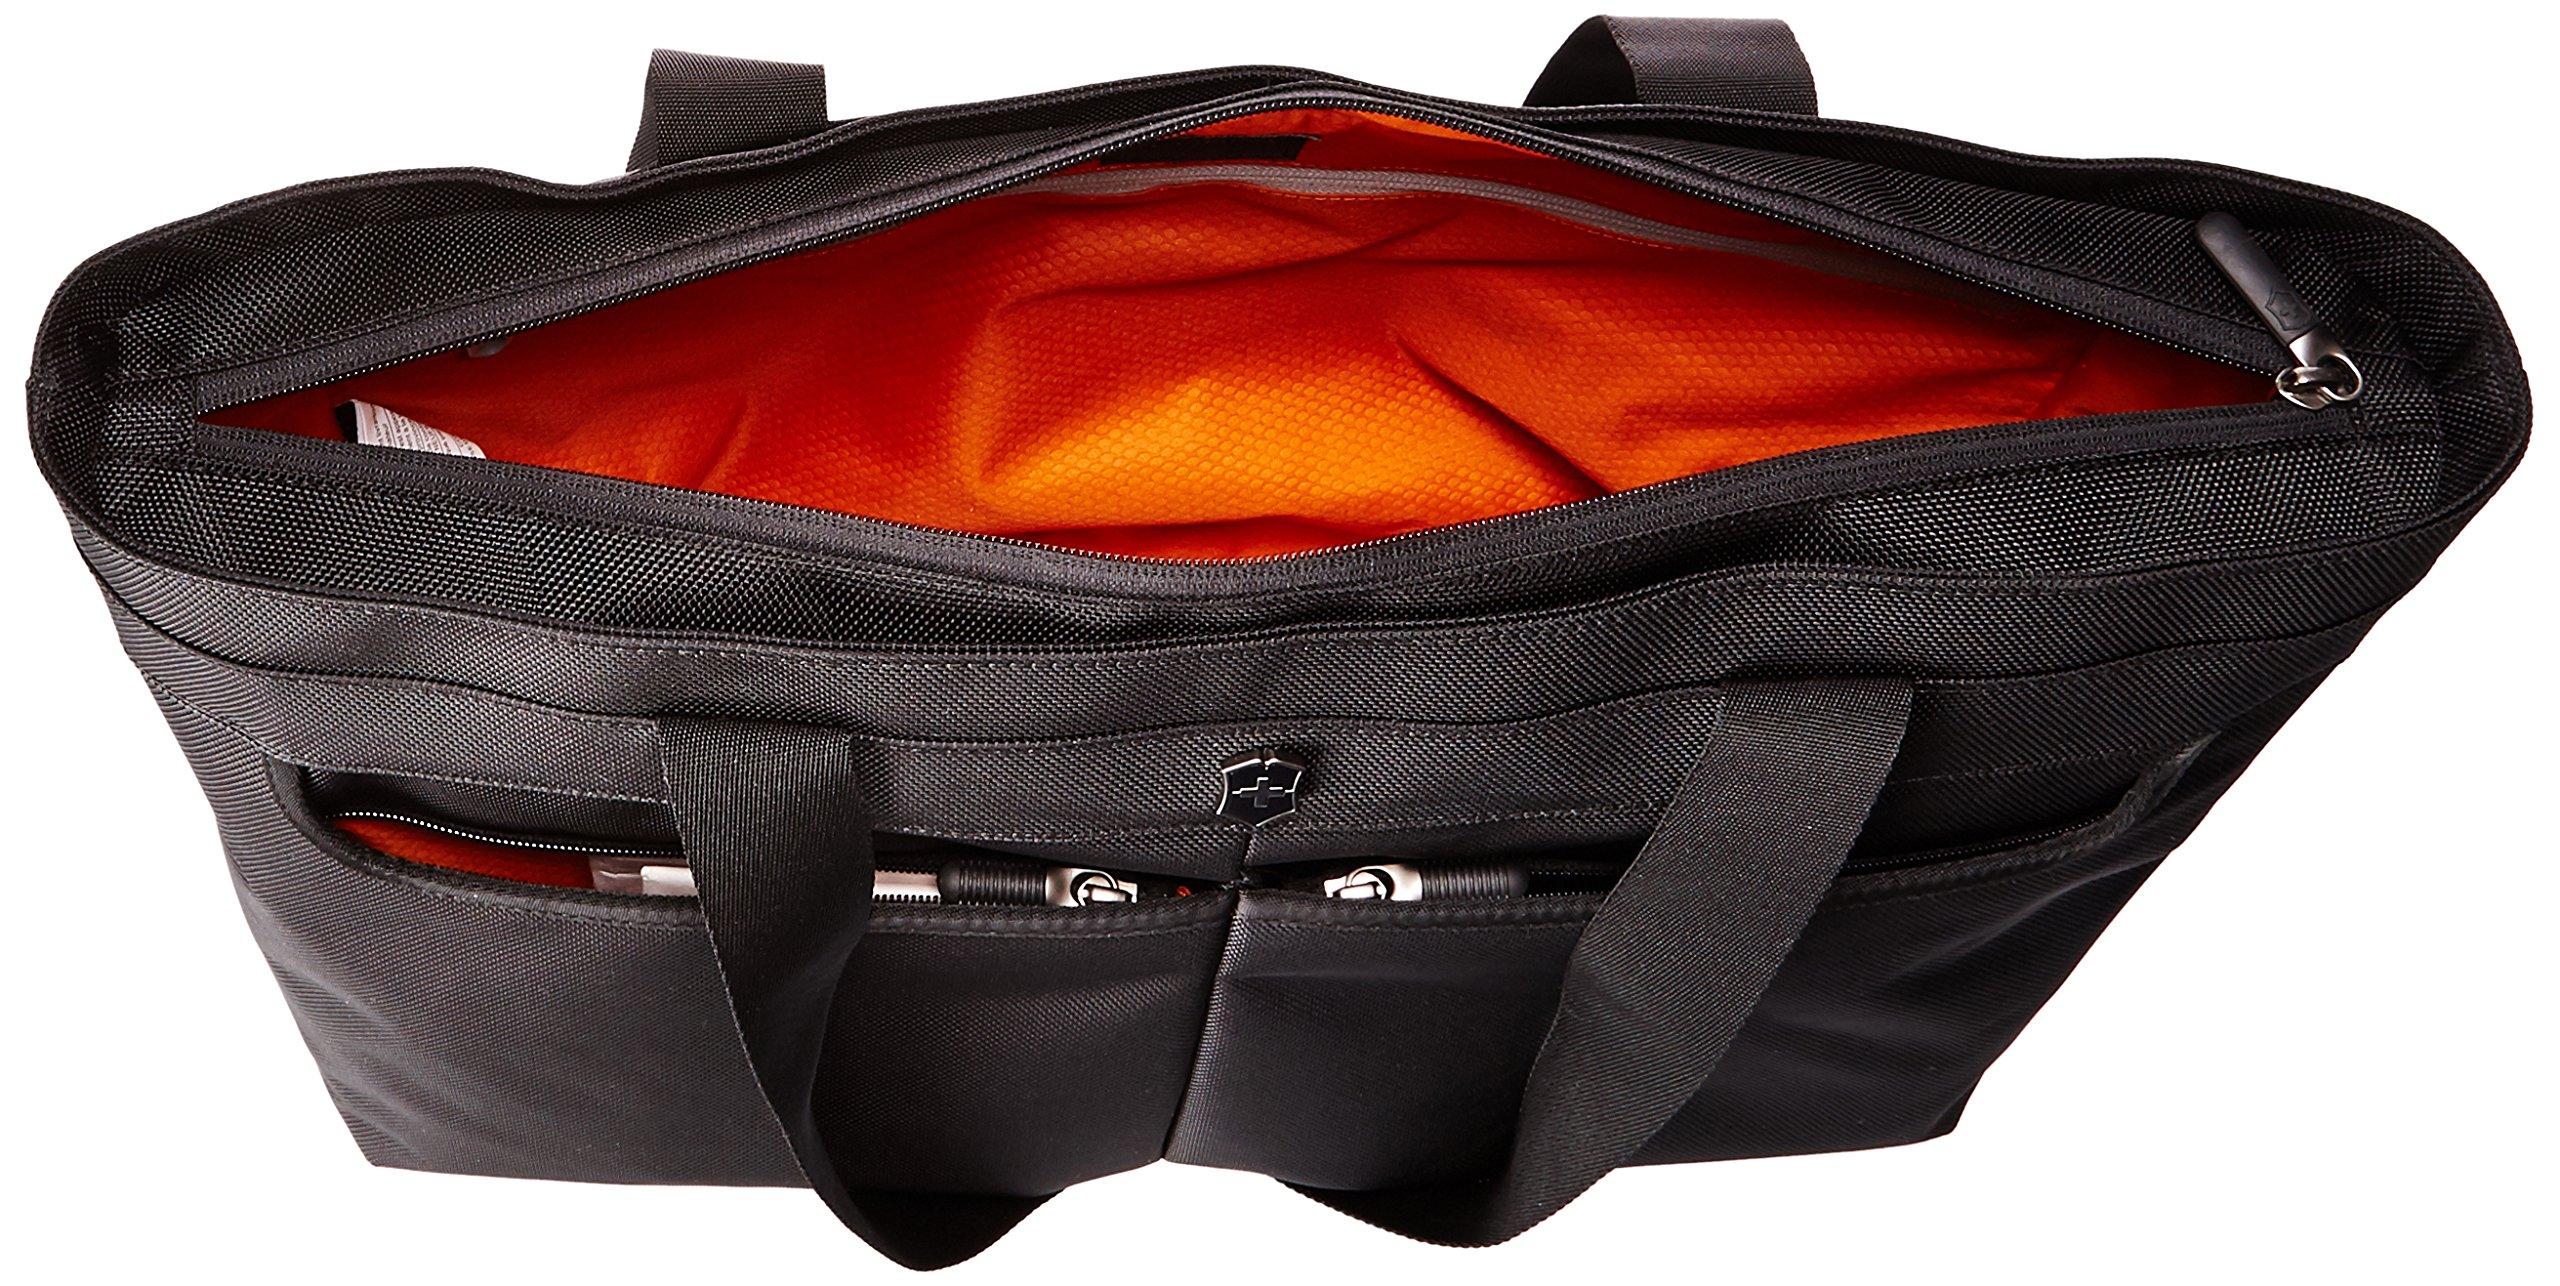 Victorinox Werks Traveler 5.0 WT Shopping Tote, Black, One Size by Victorinox (Image #6)